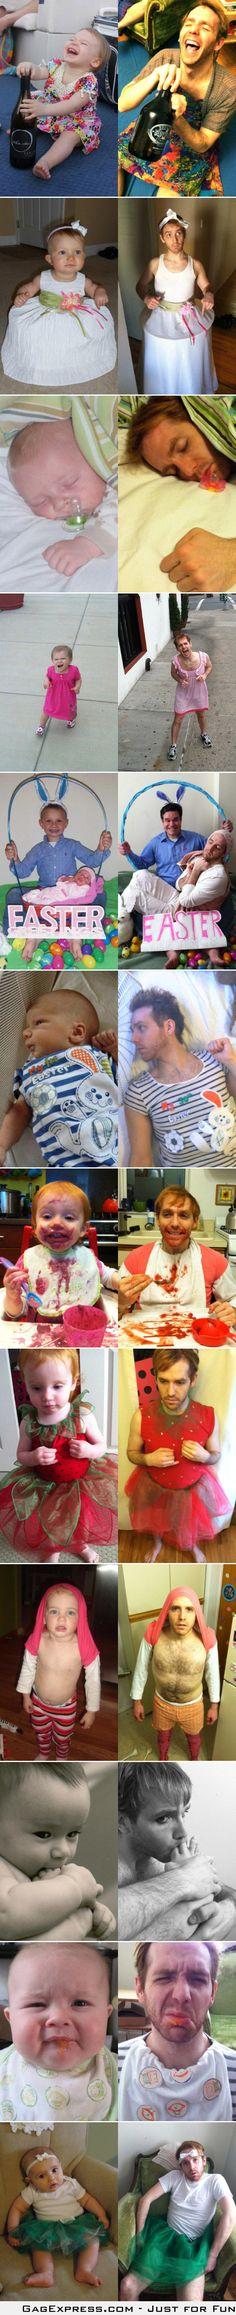 Baby pictures reenacted